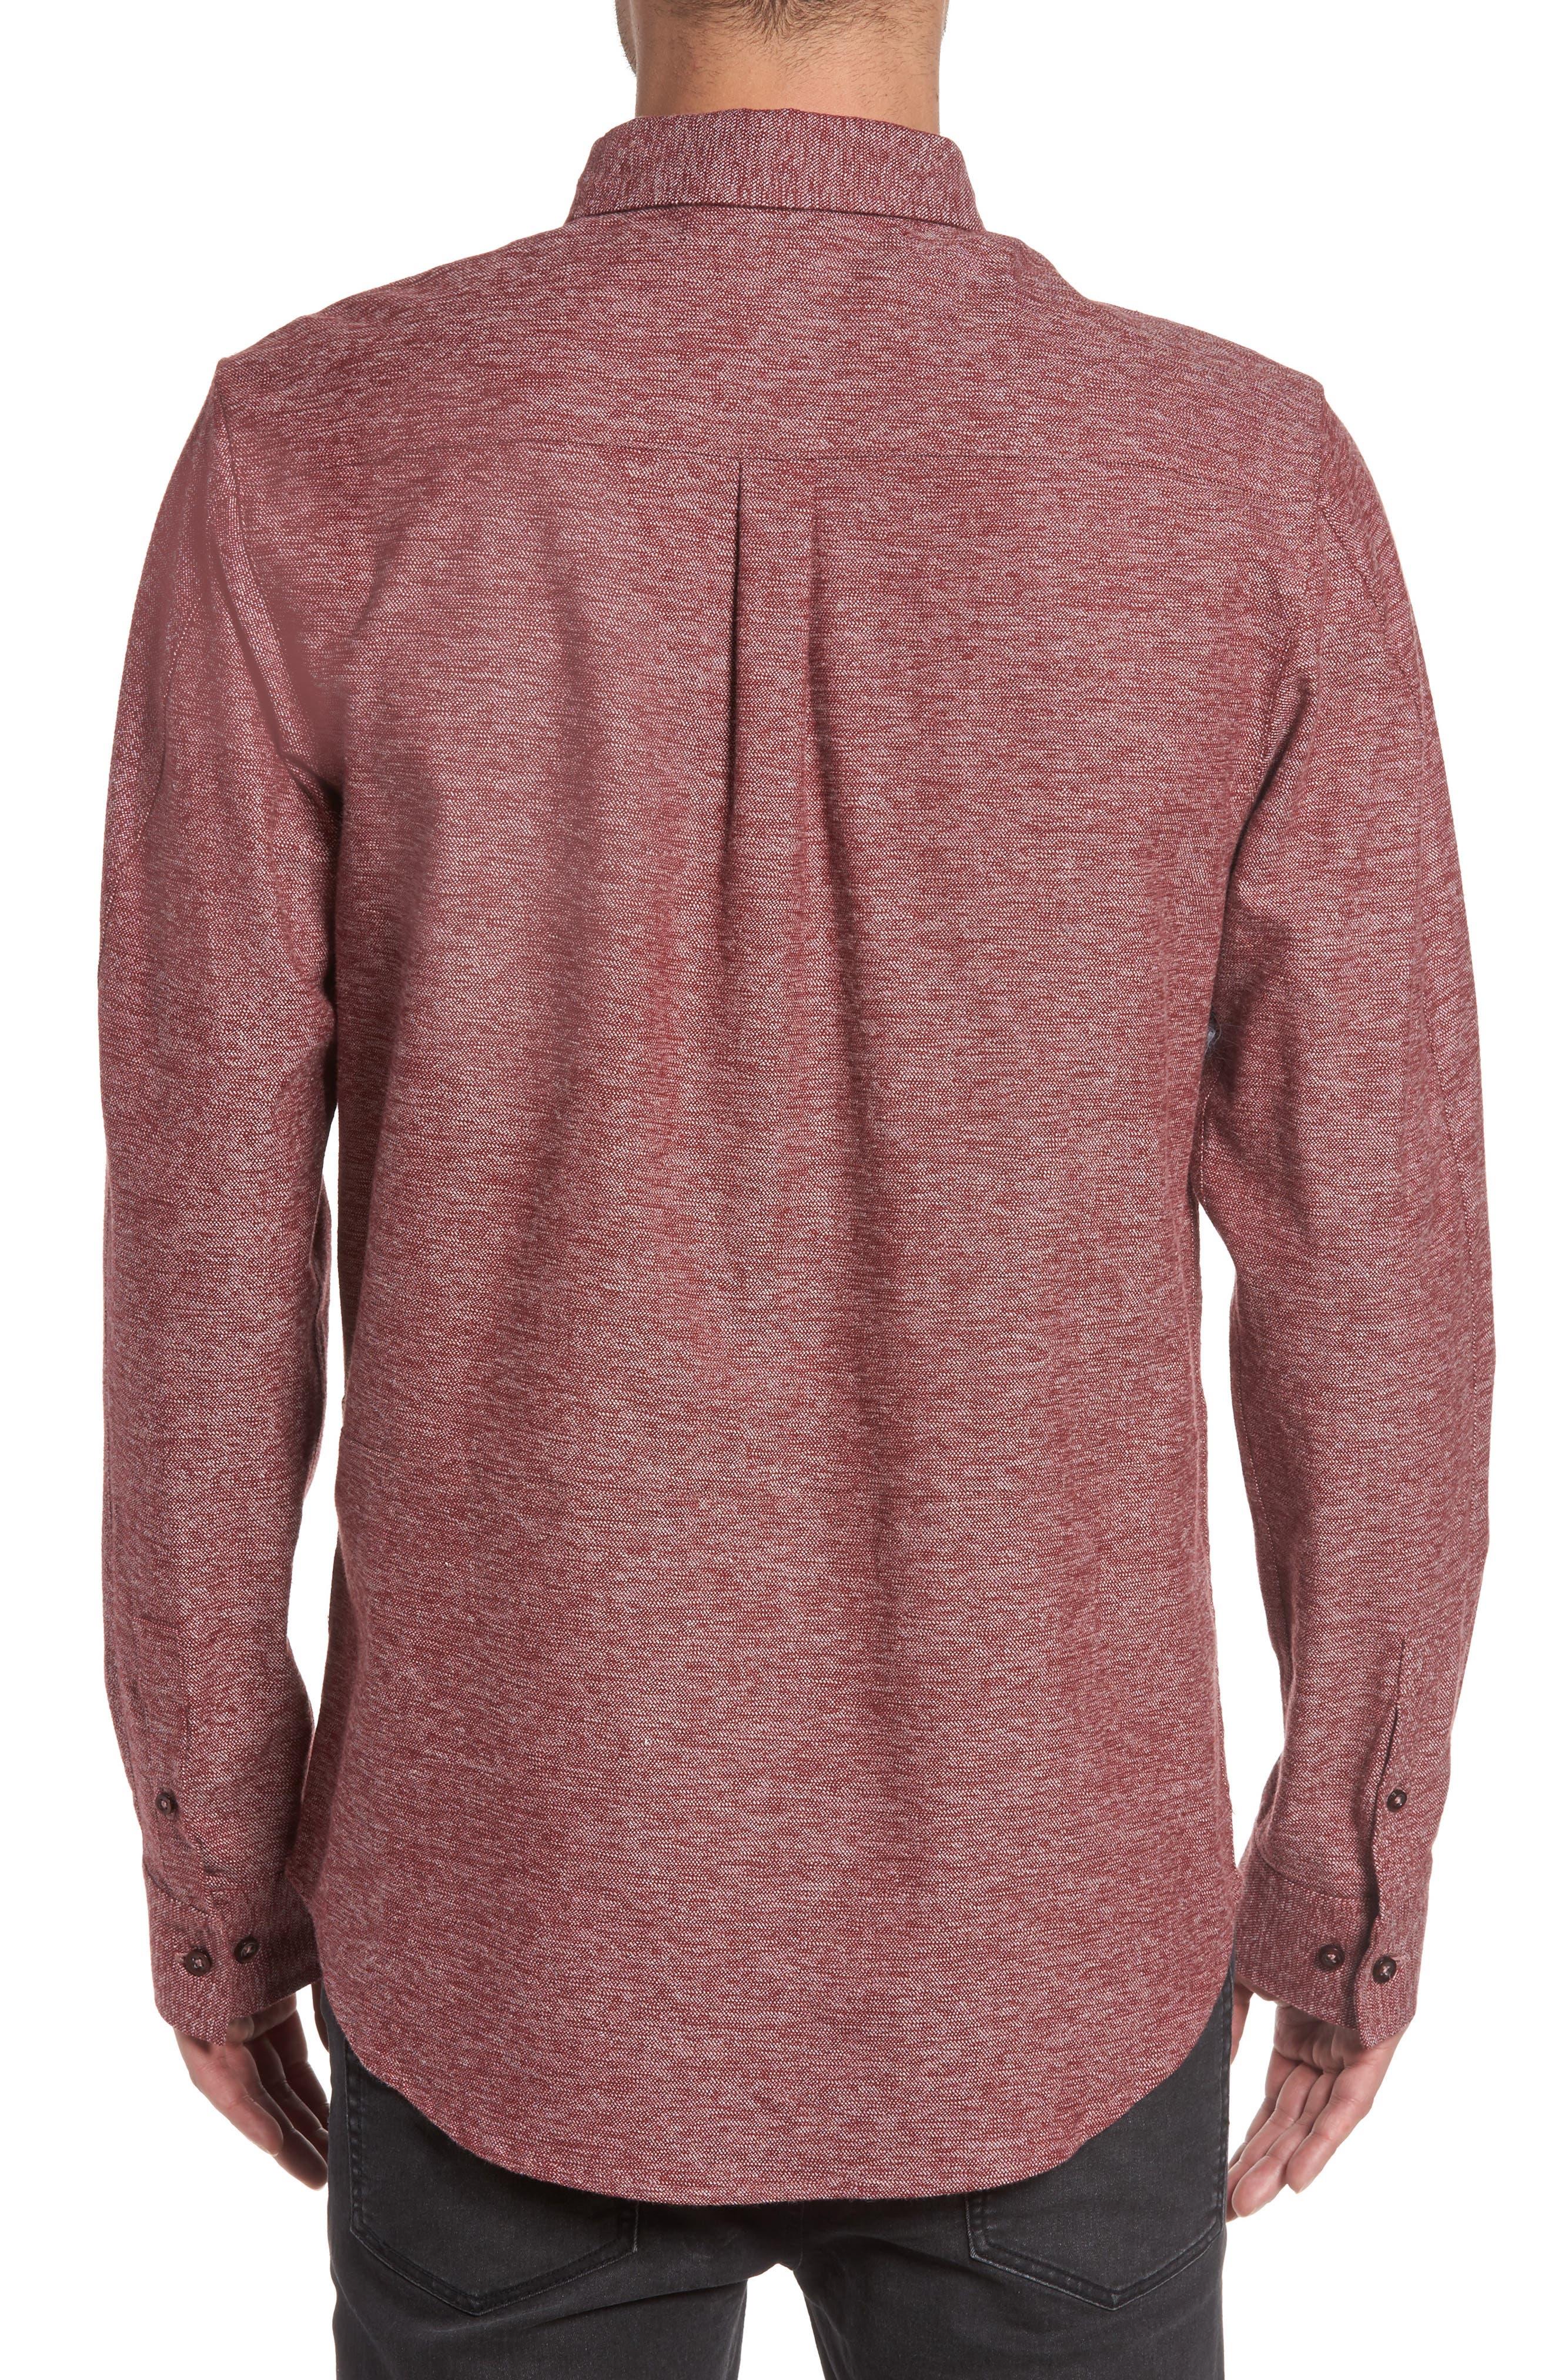 Holgate Flex Shirt,                             Alternate thumbnail 4, color,